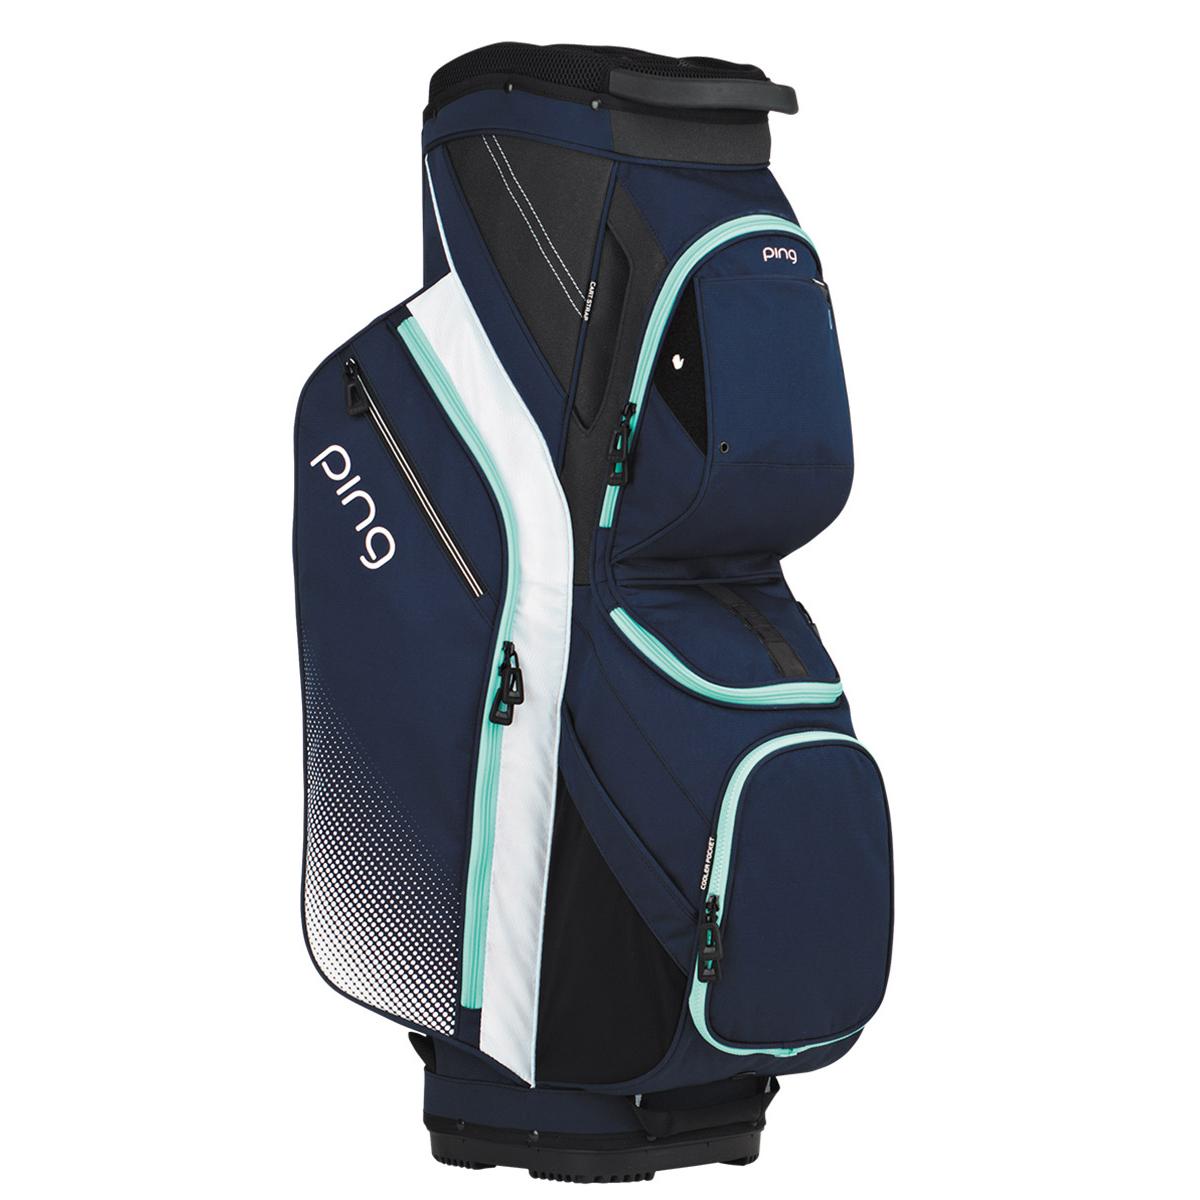 f5bab5711f PING Traverse Ladies Cart Bag from american golf